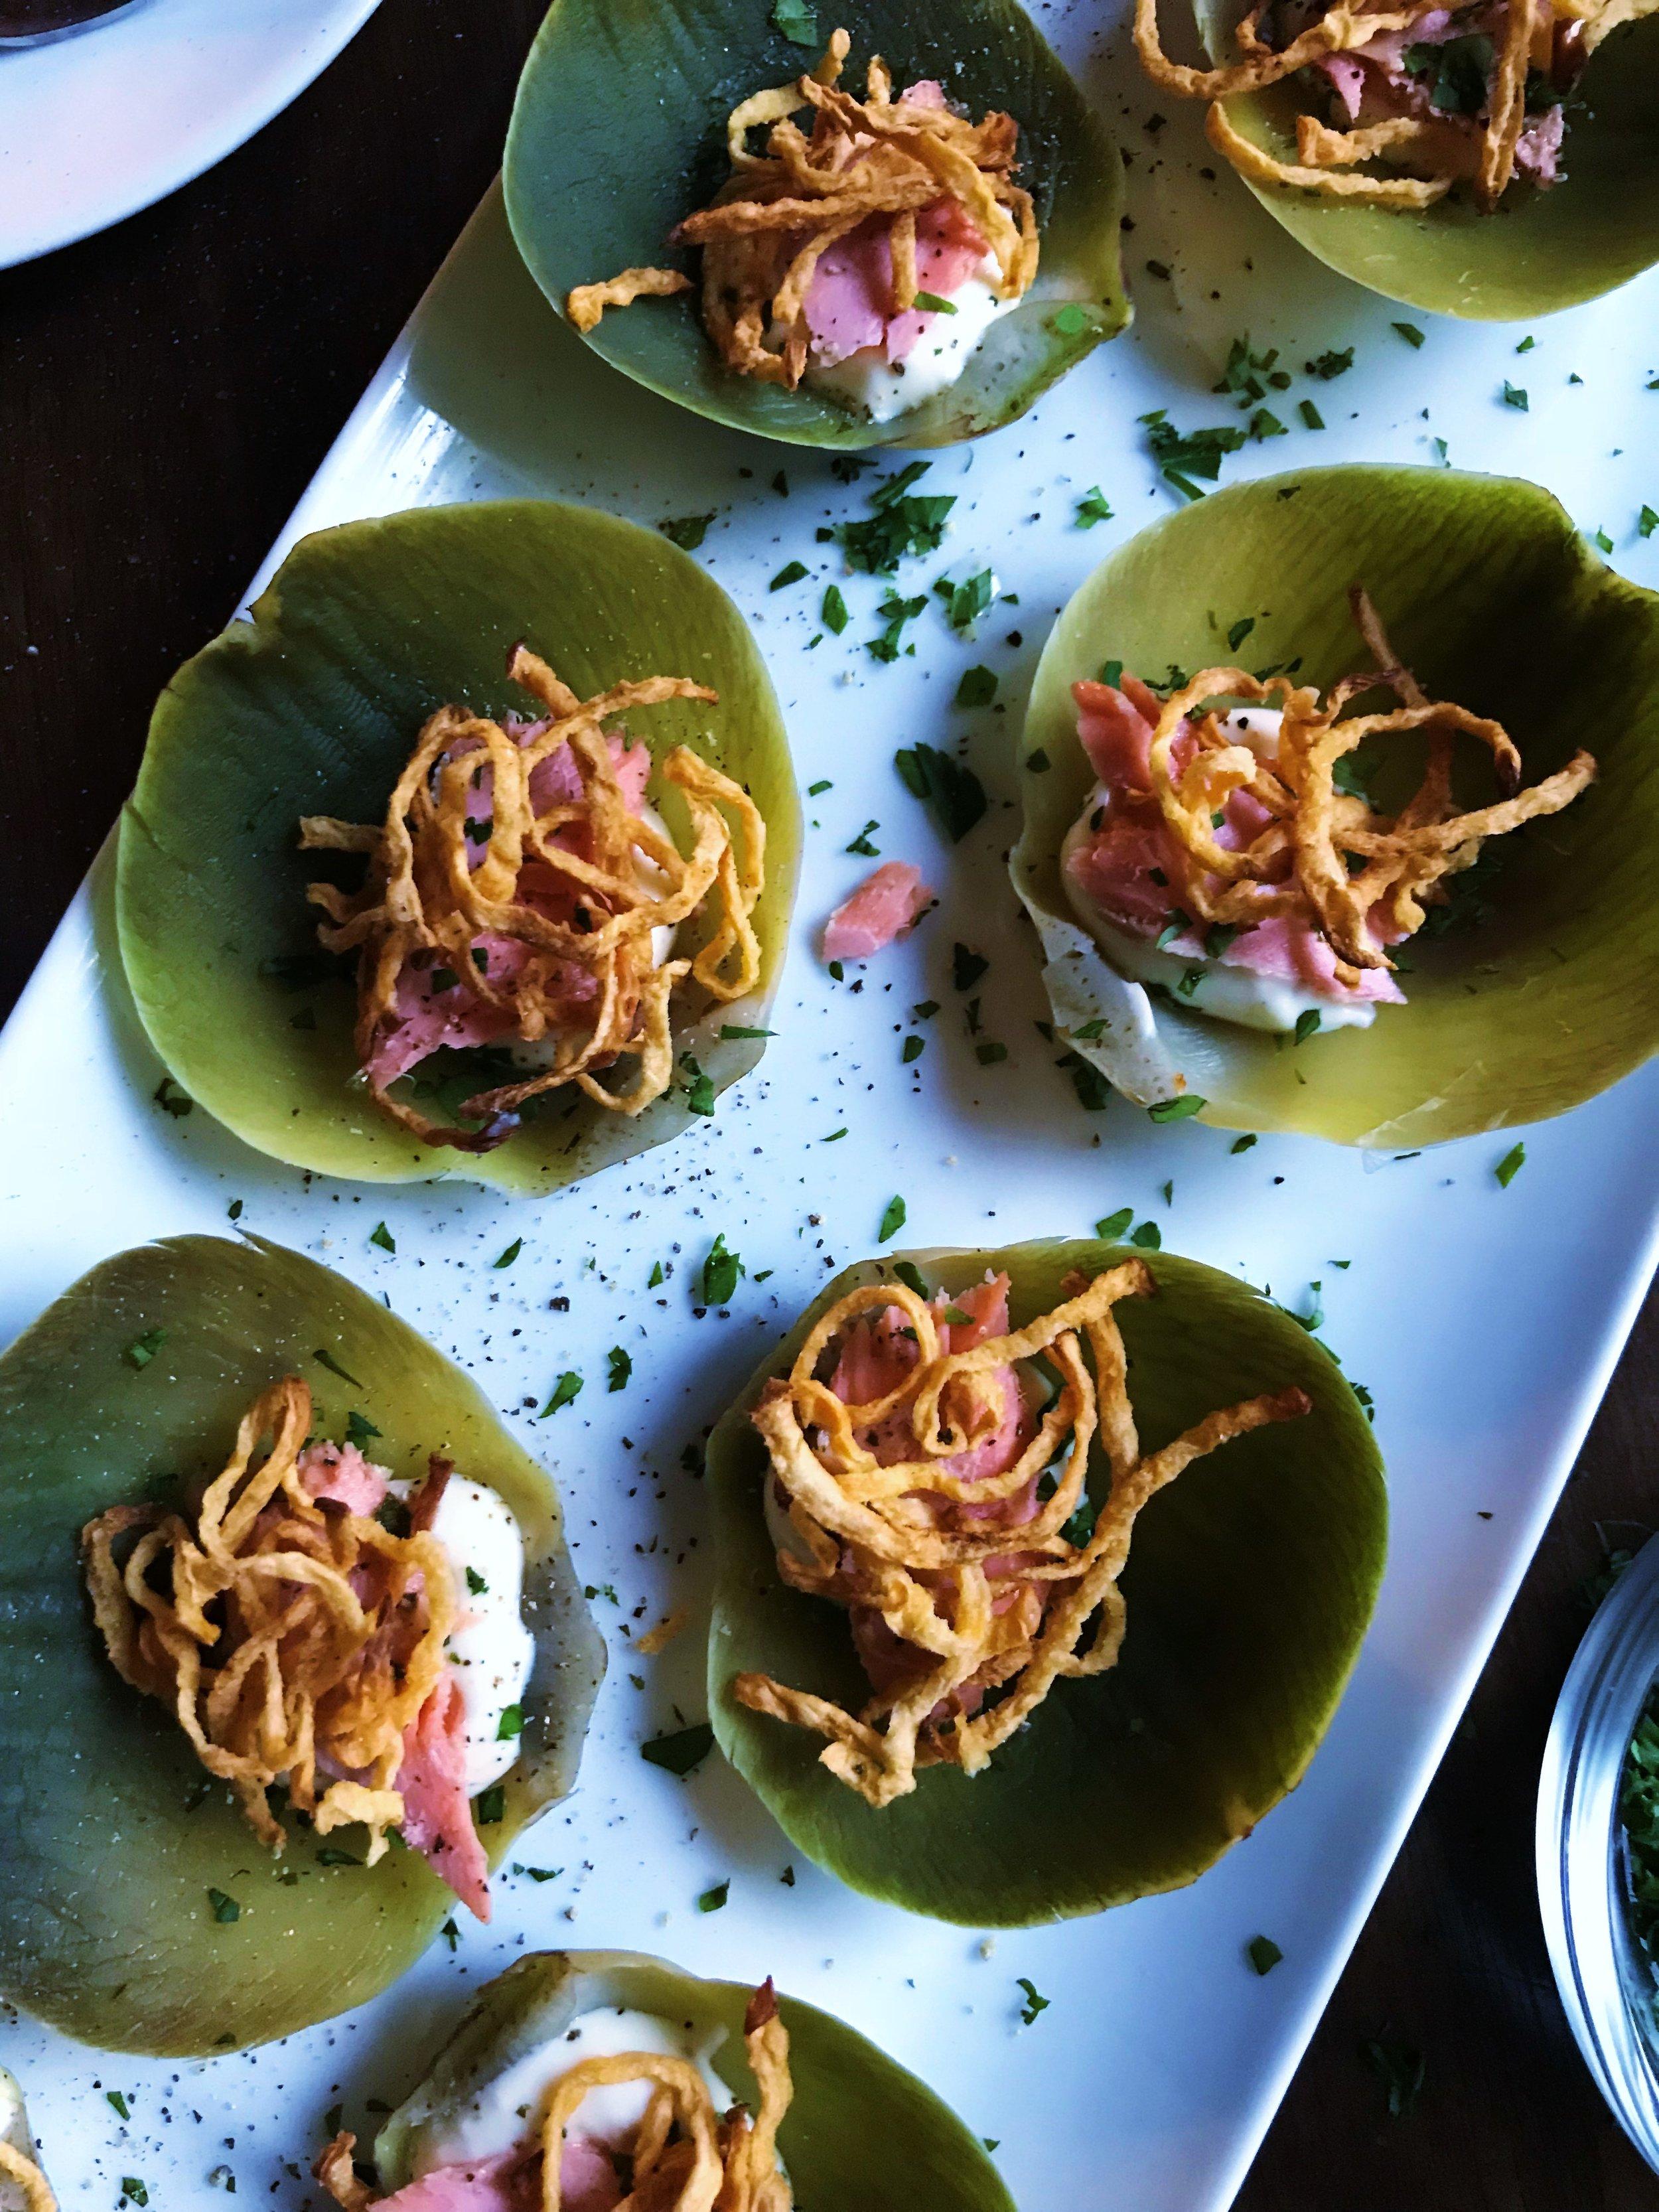 Artichoke Leaf Appetizer with Salmon and Rutabaga Straws-p2.jpg